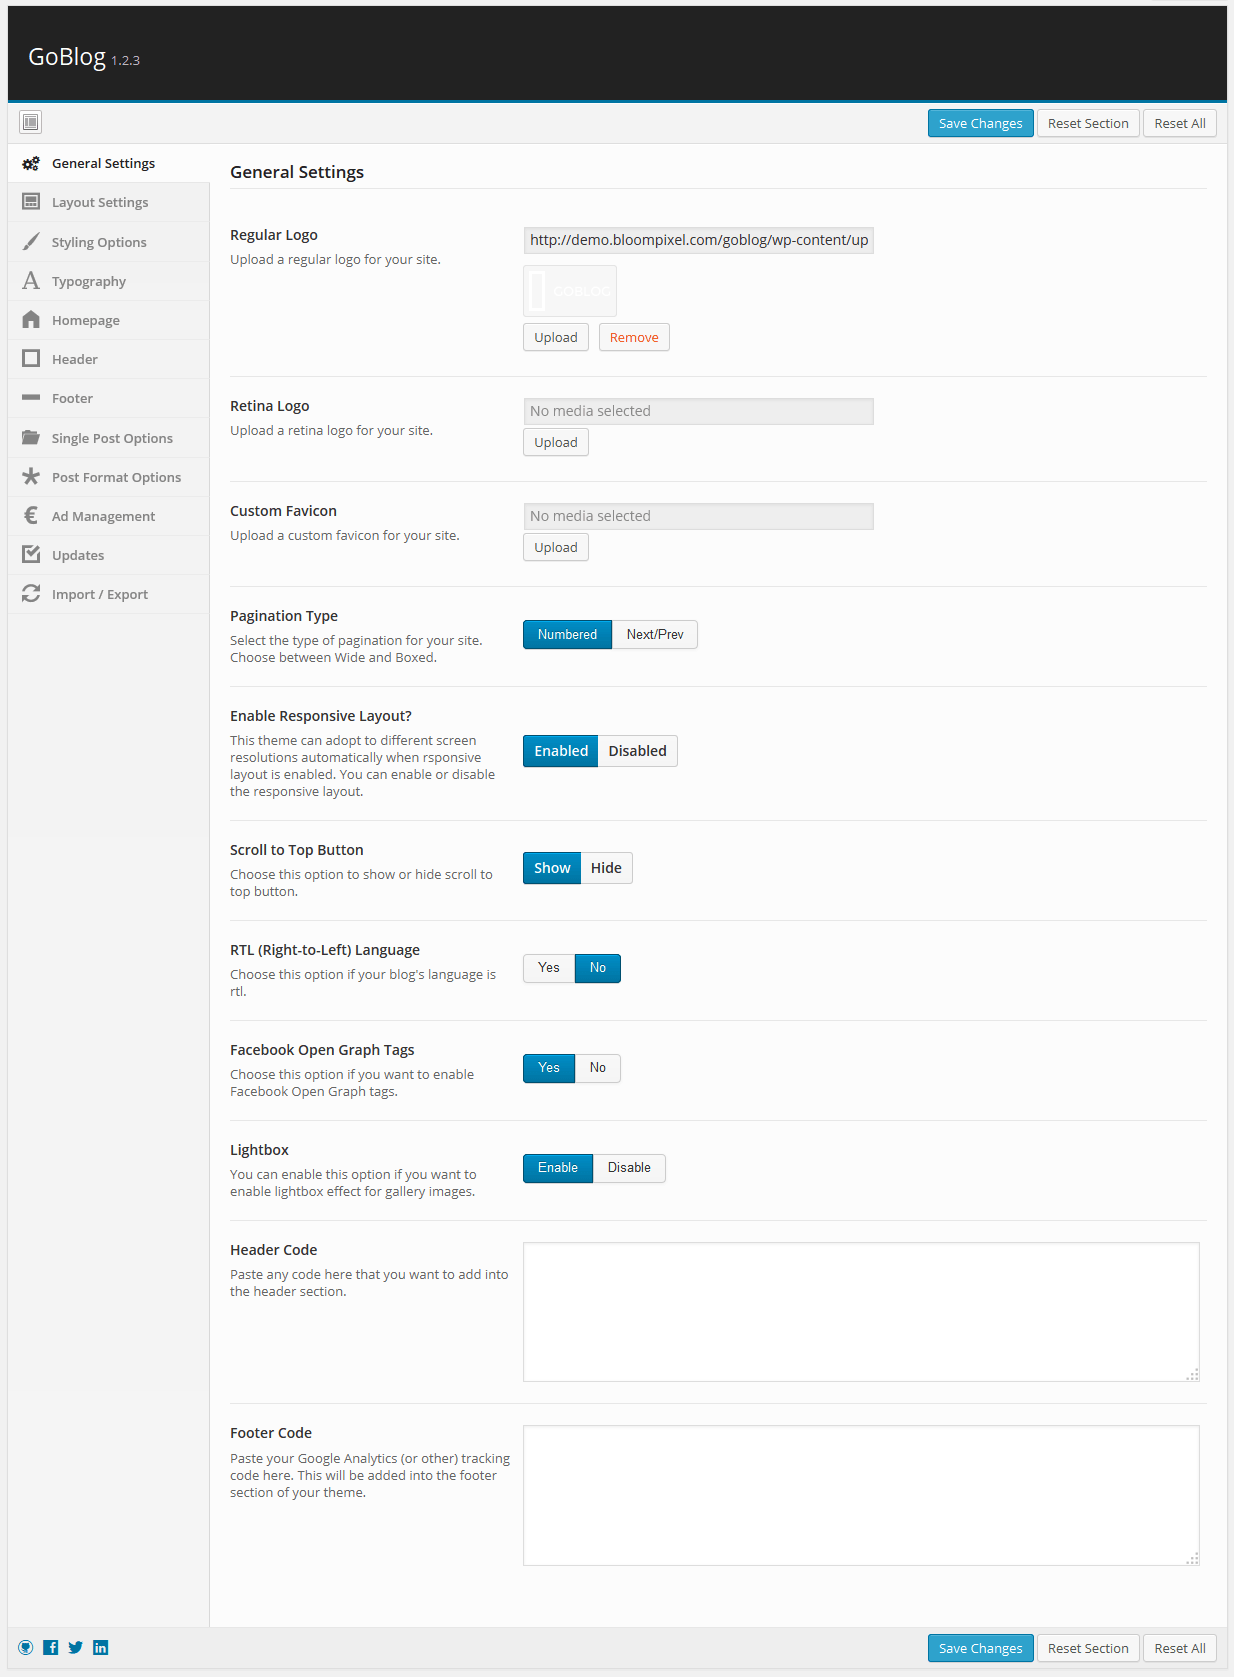 goblog-general-settings